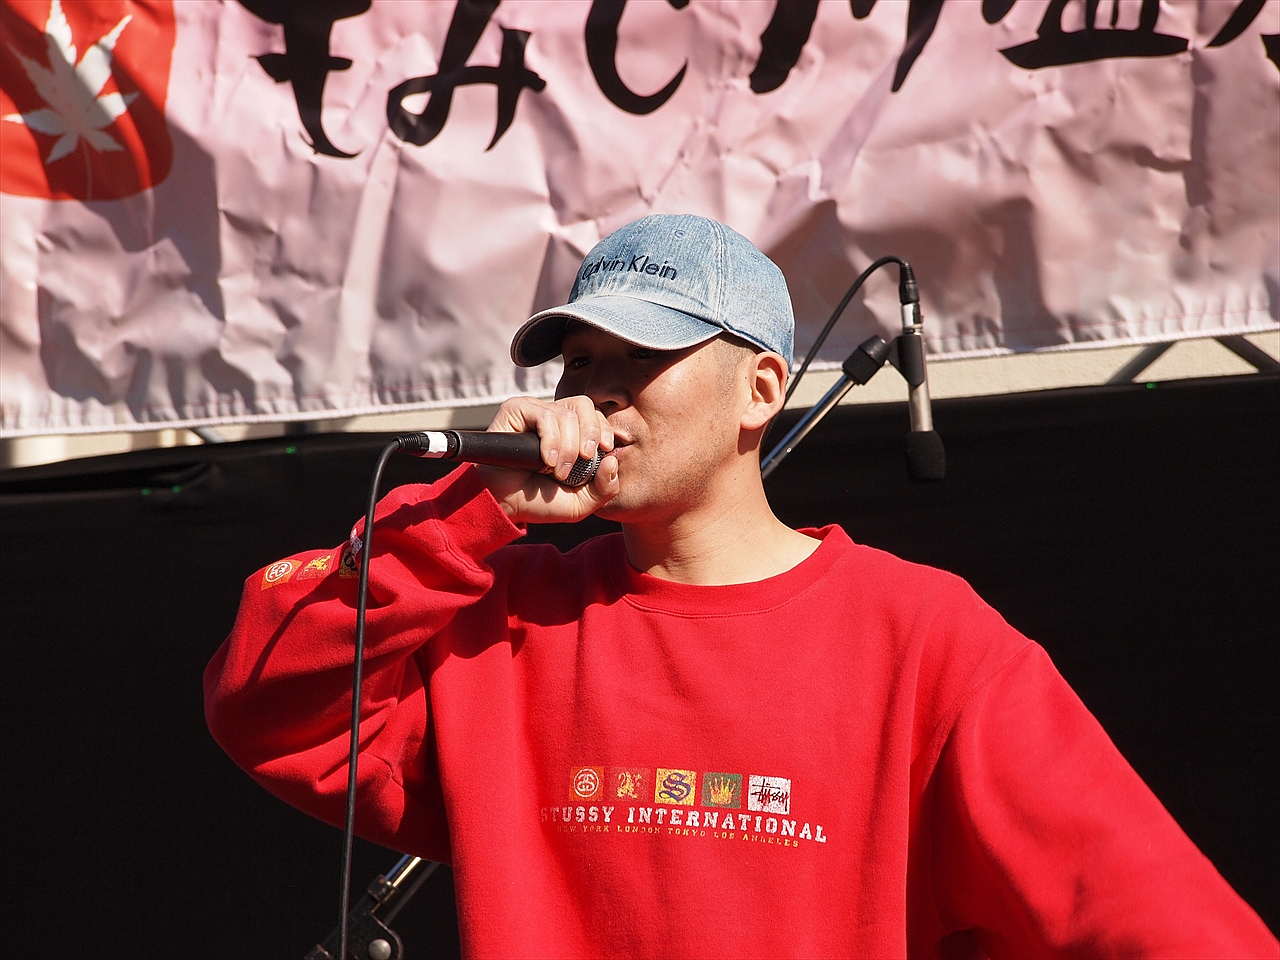 K's-FACTORY もみじ川温泉 さくら祭り エキサイティングサマーinワジキ 2019 オーディション